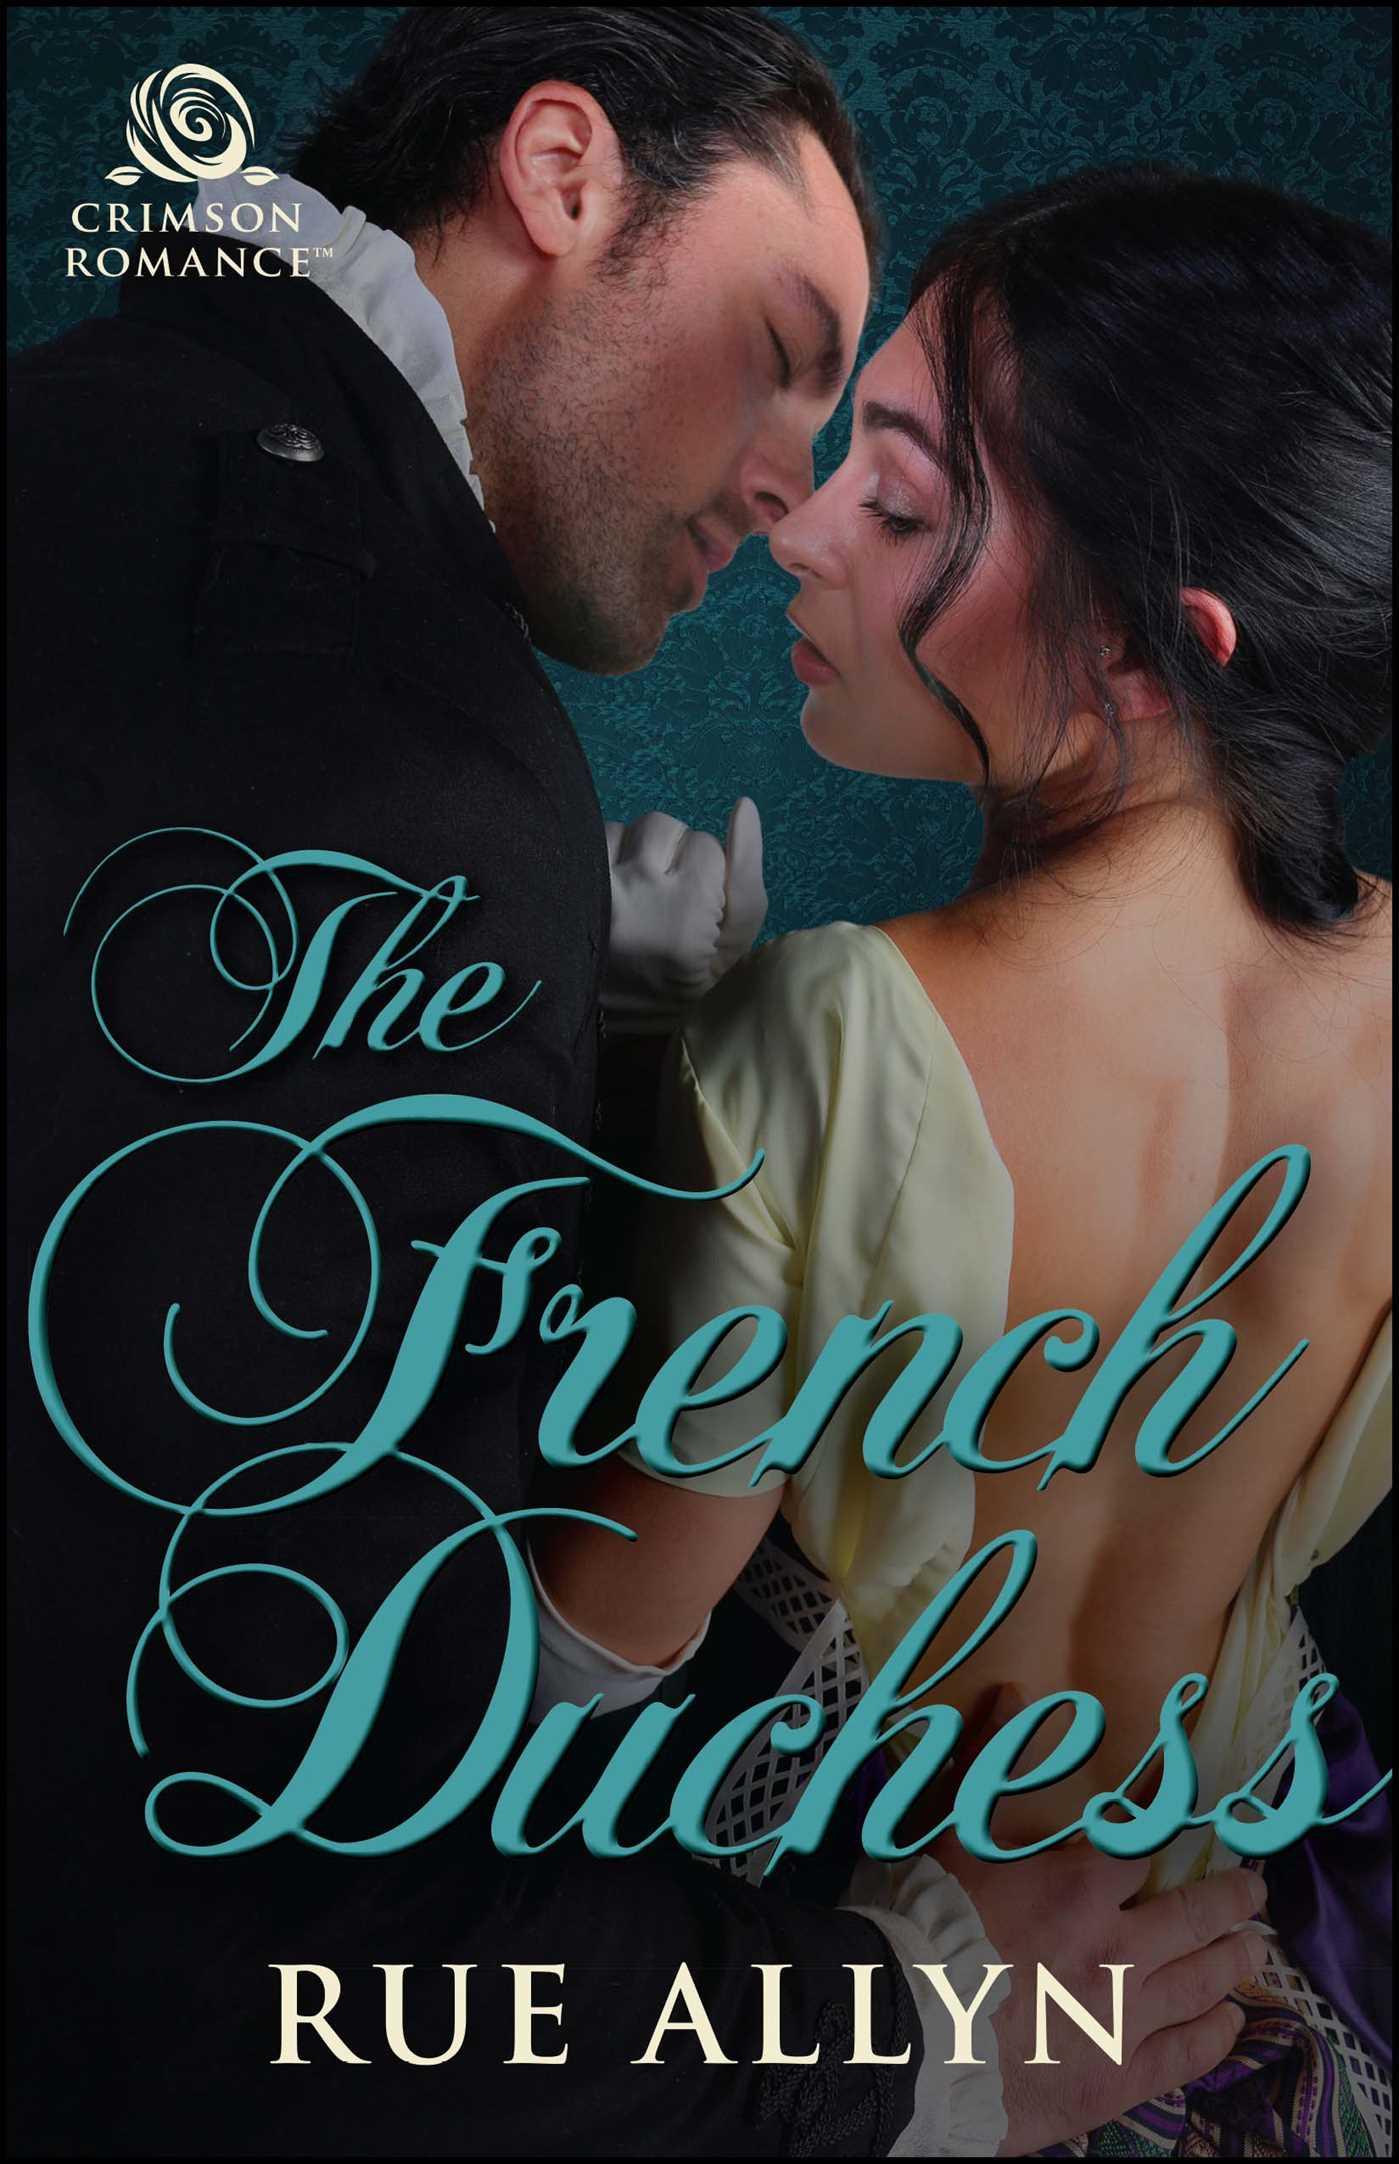 The french duchess 9781507207444 hr